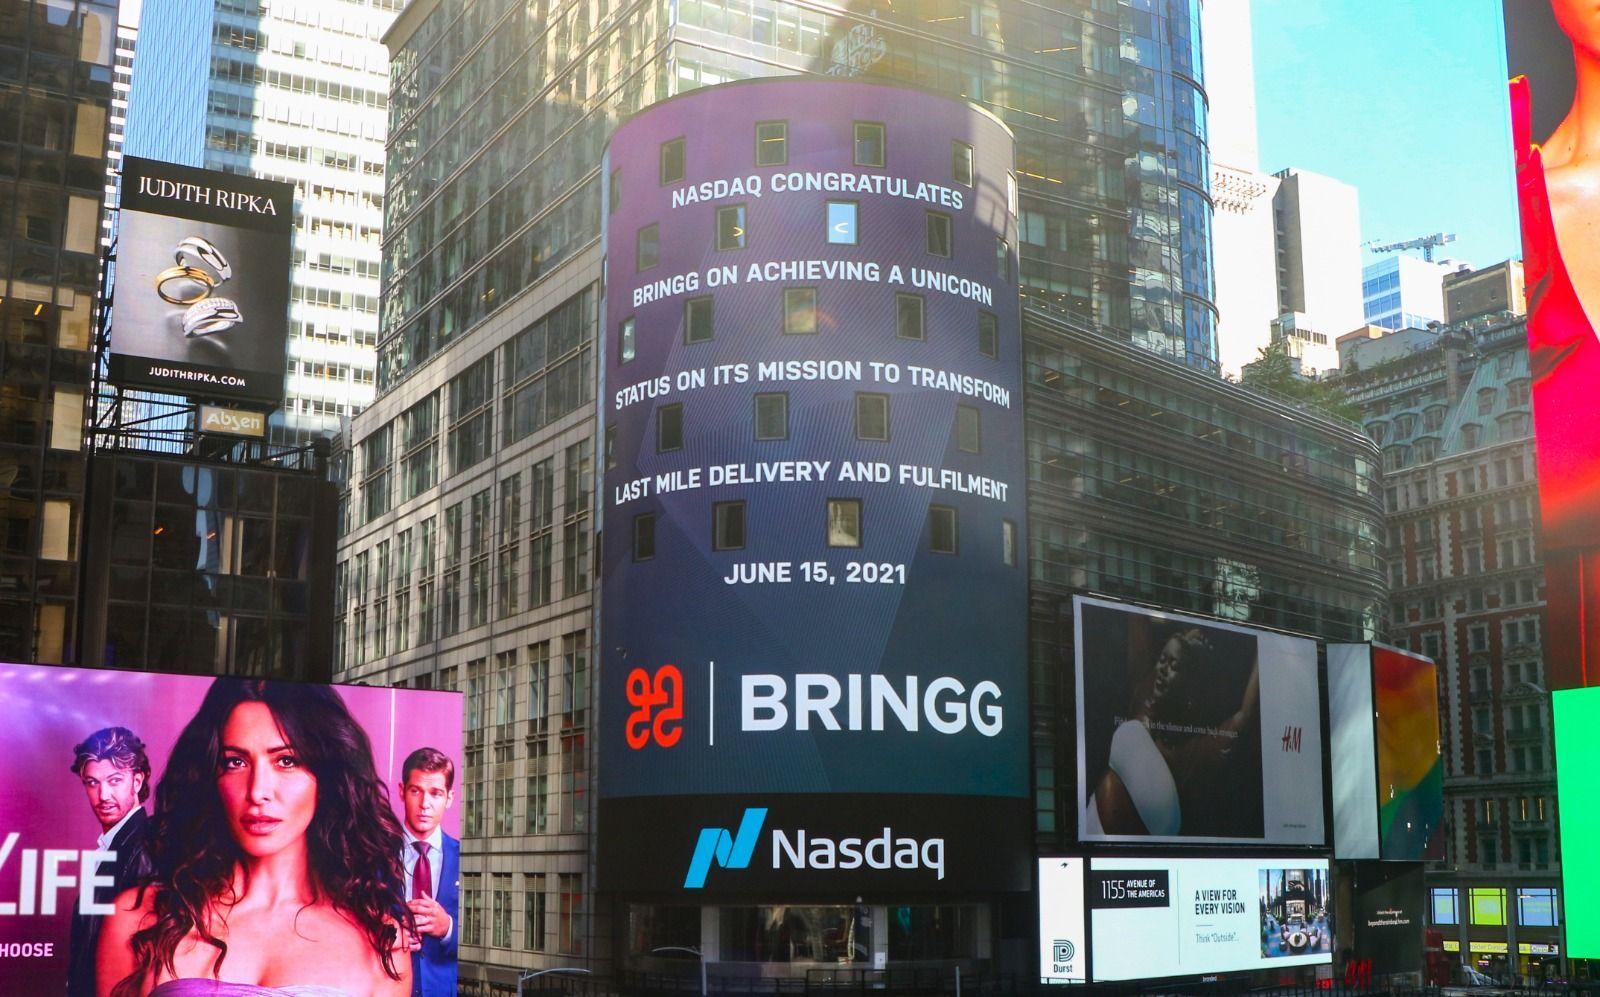 Cambridge Capital's Bringg on Nasdaq sign in Times Square